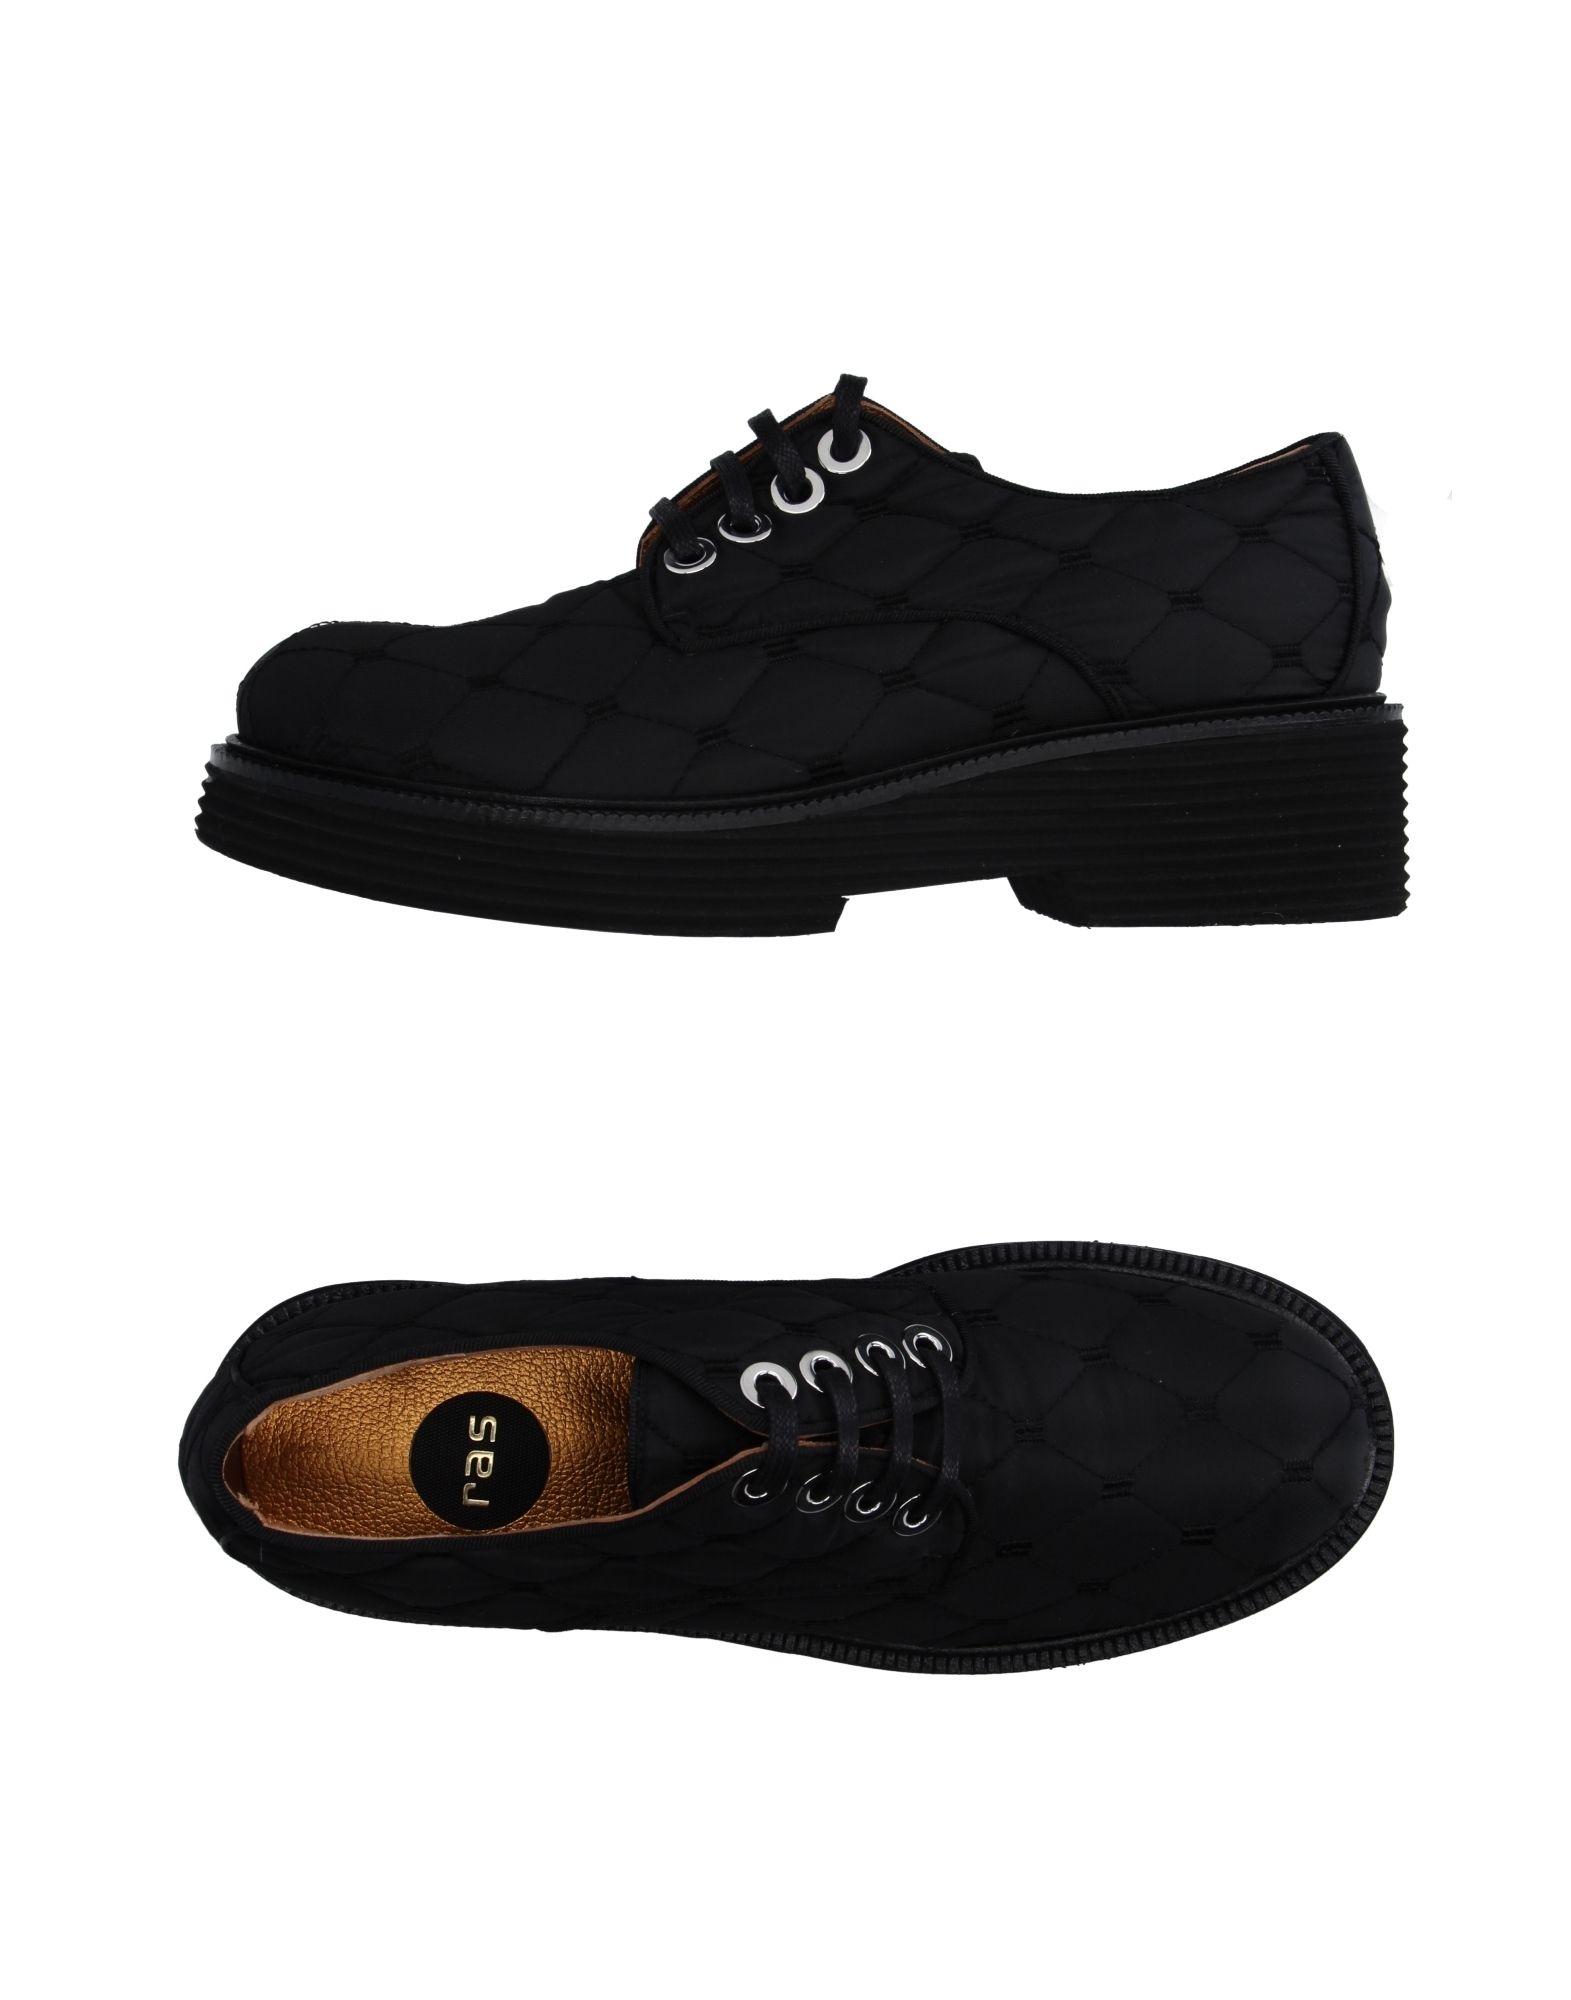 Ras Schnürschuhe Damen  11104611UV Gute Qualität beliebte Schuhe